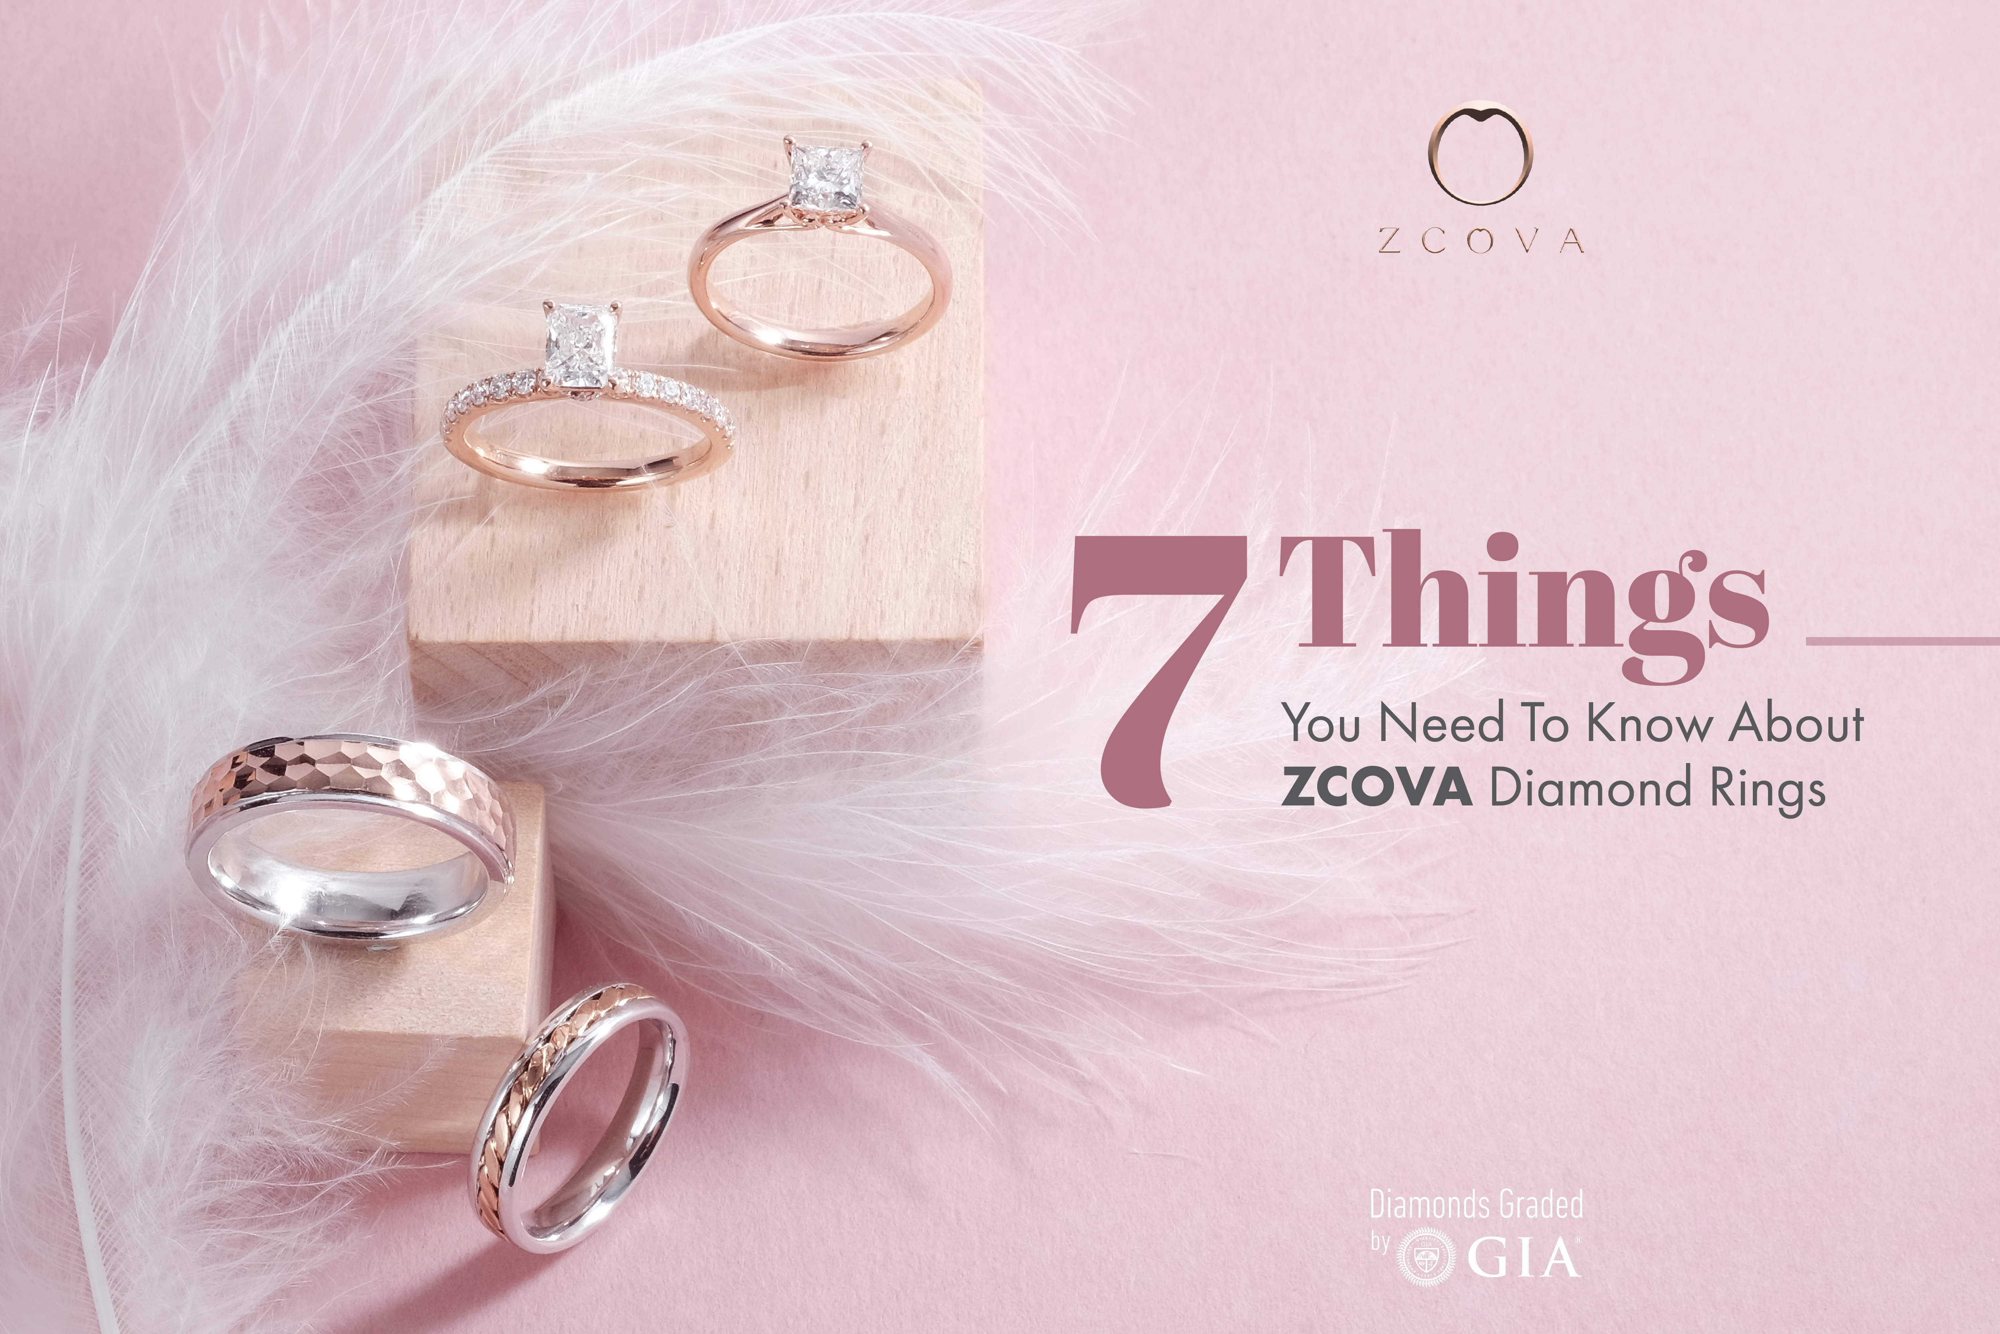 ZCOVA Diamond Rings